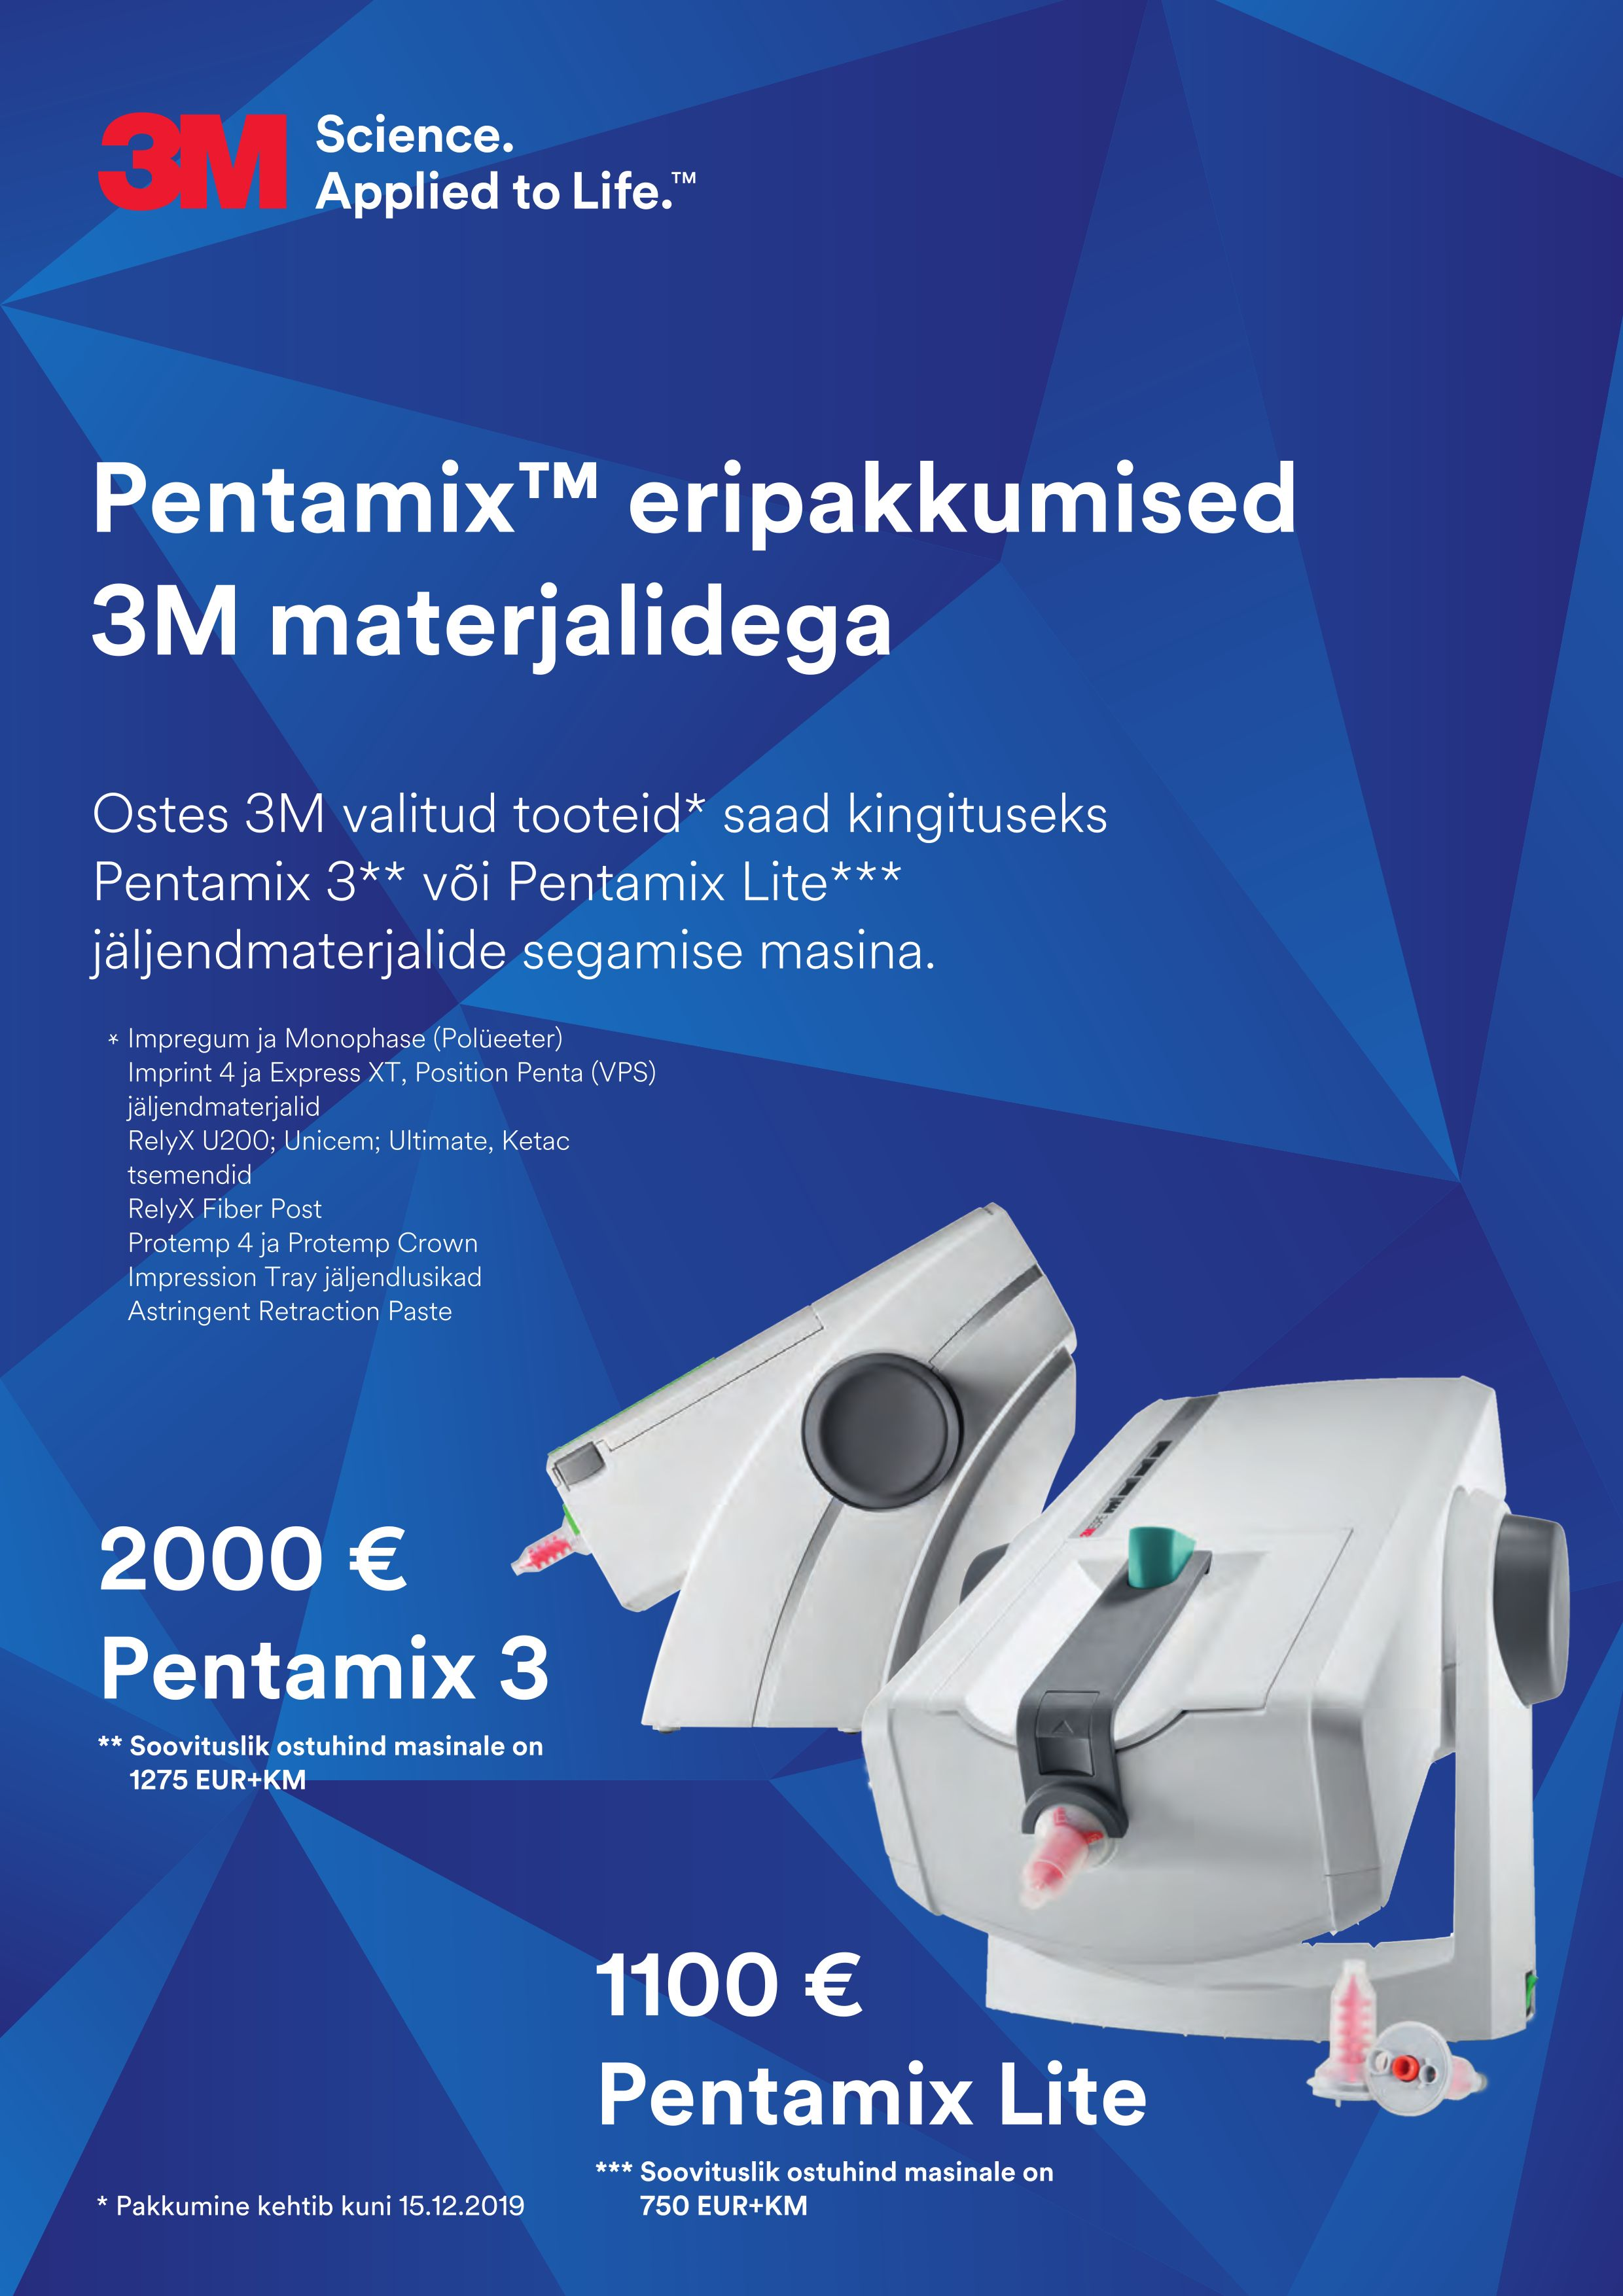 6d975dc9c36 Pentamix eripakkumised 3M materjalidega. Prodent OÜ